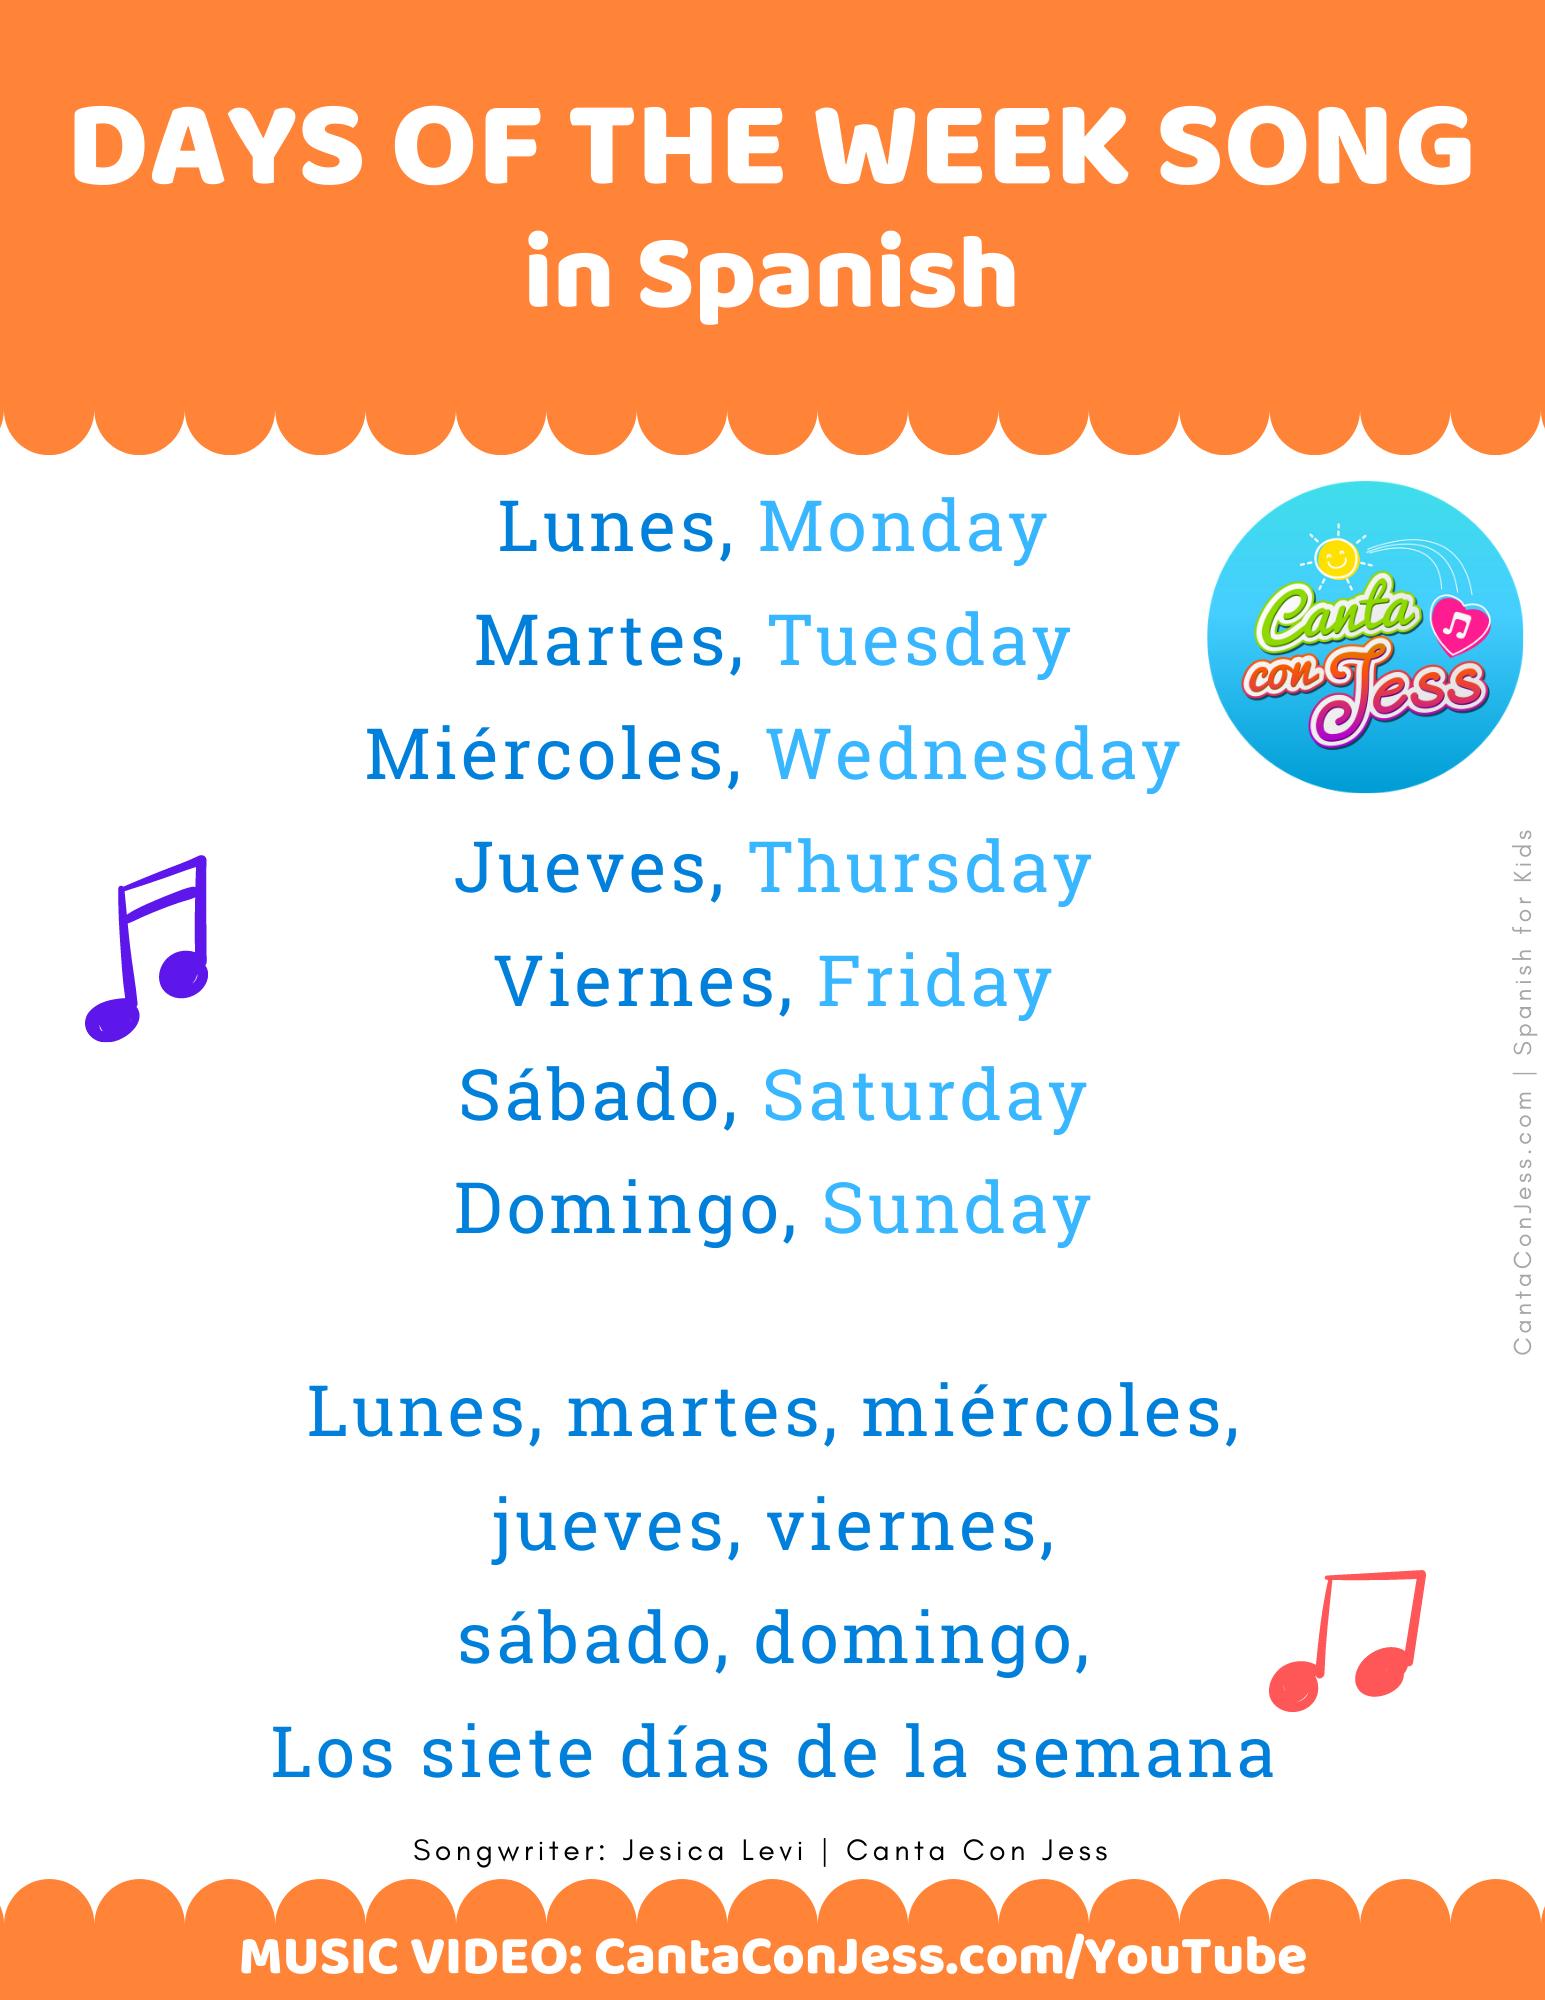 Days of the Week Song in Spanish LYRICS